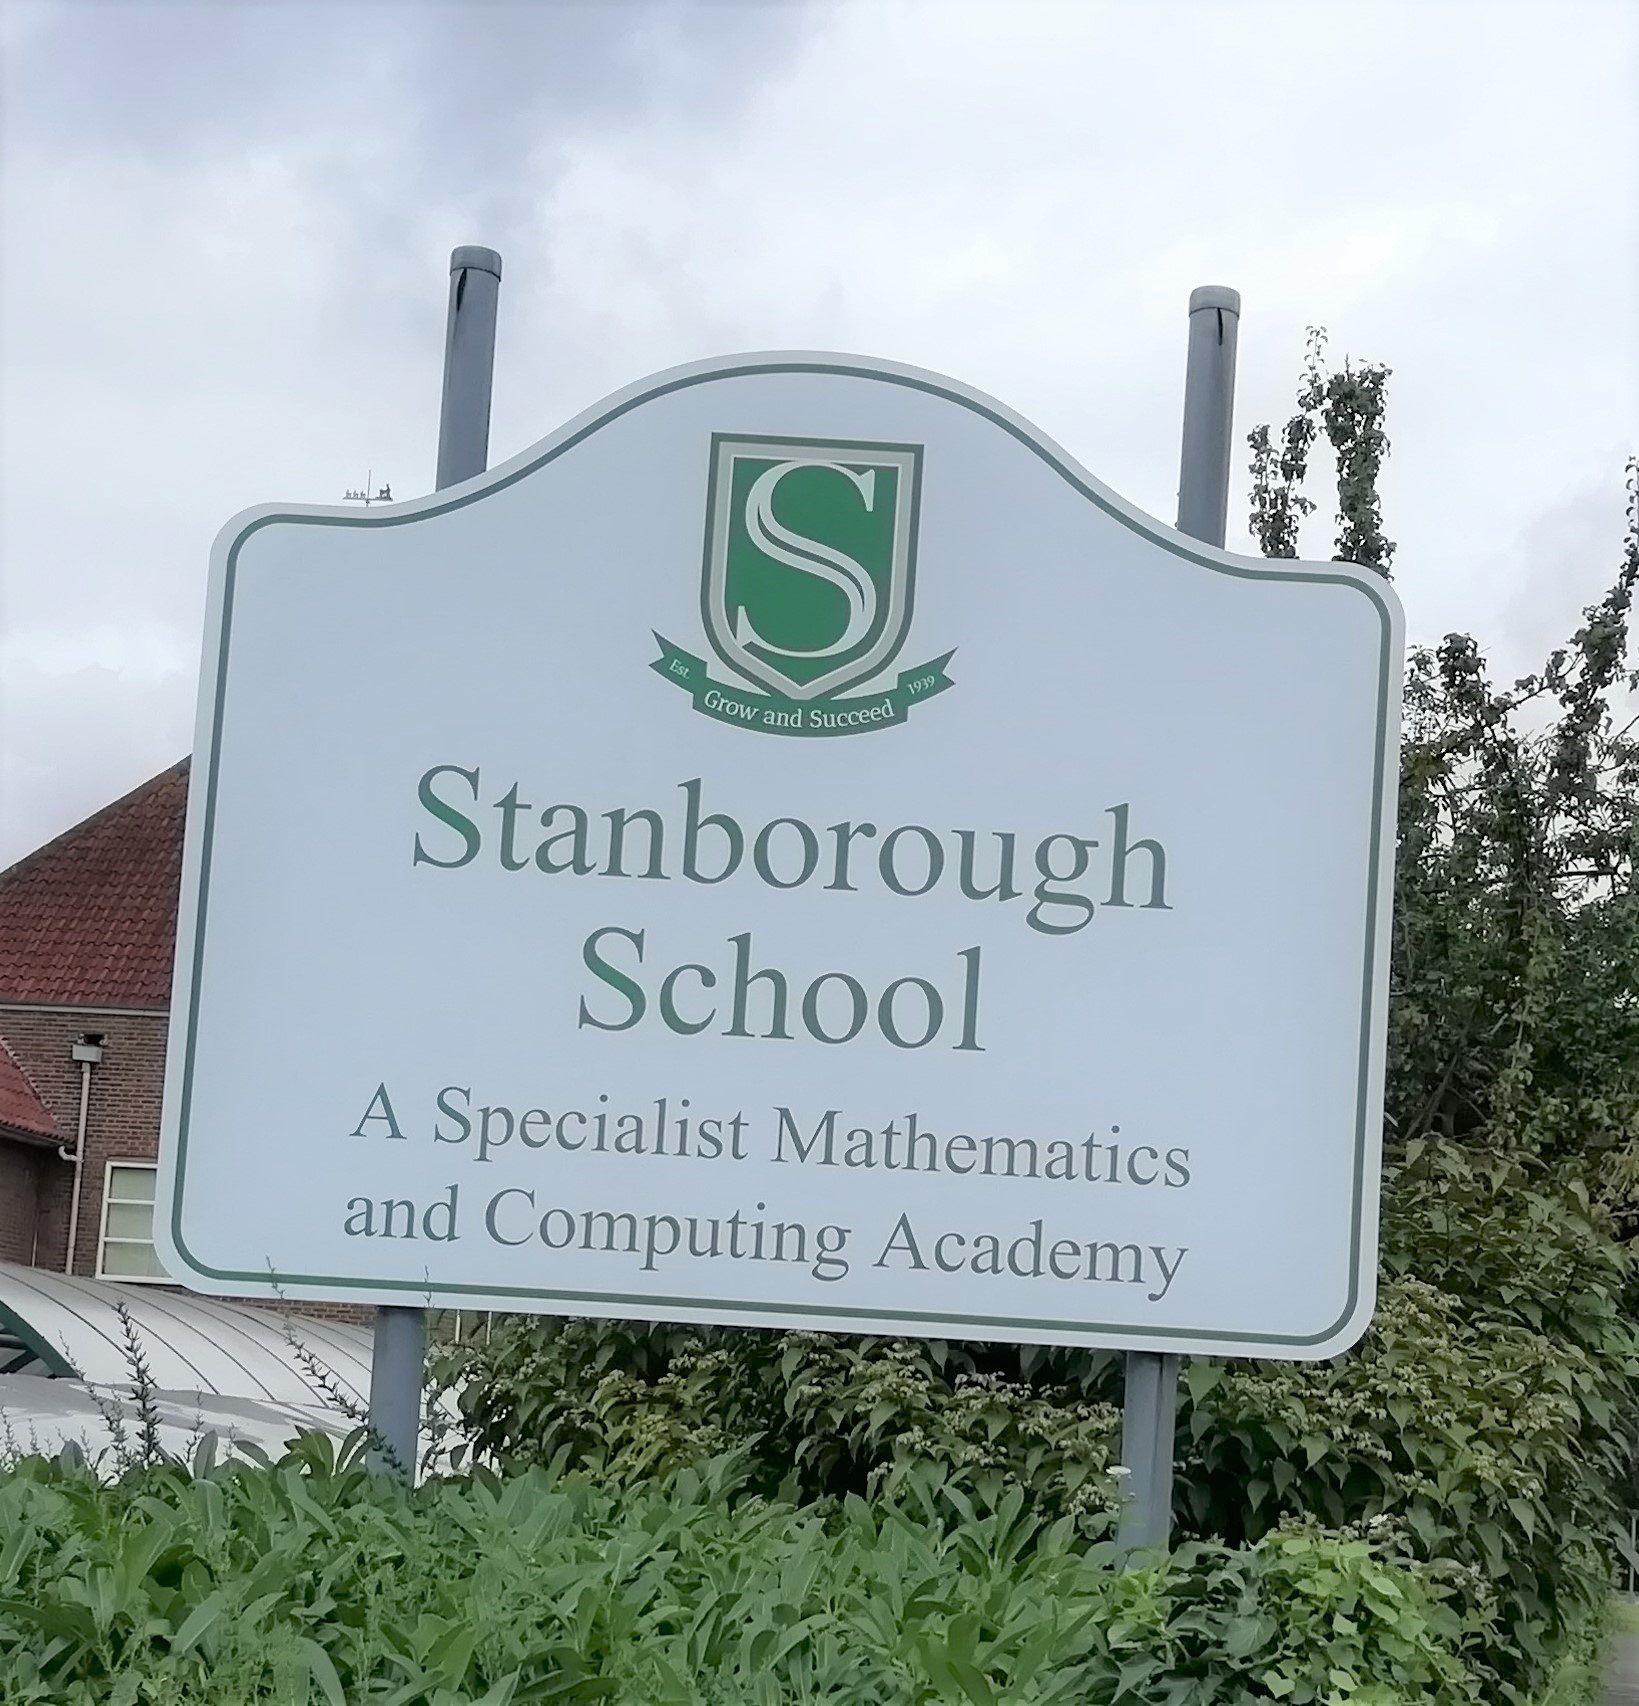 Inspection of 2 Staircases, Stanborough School, Hemel Hempstead, Hertfordshire 1